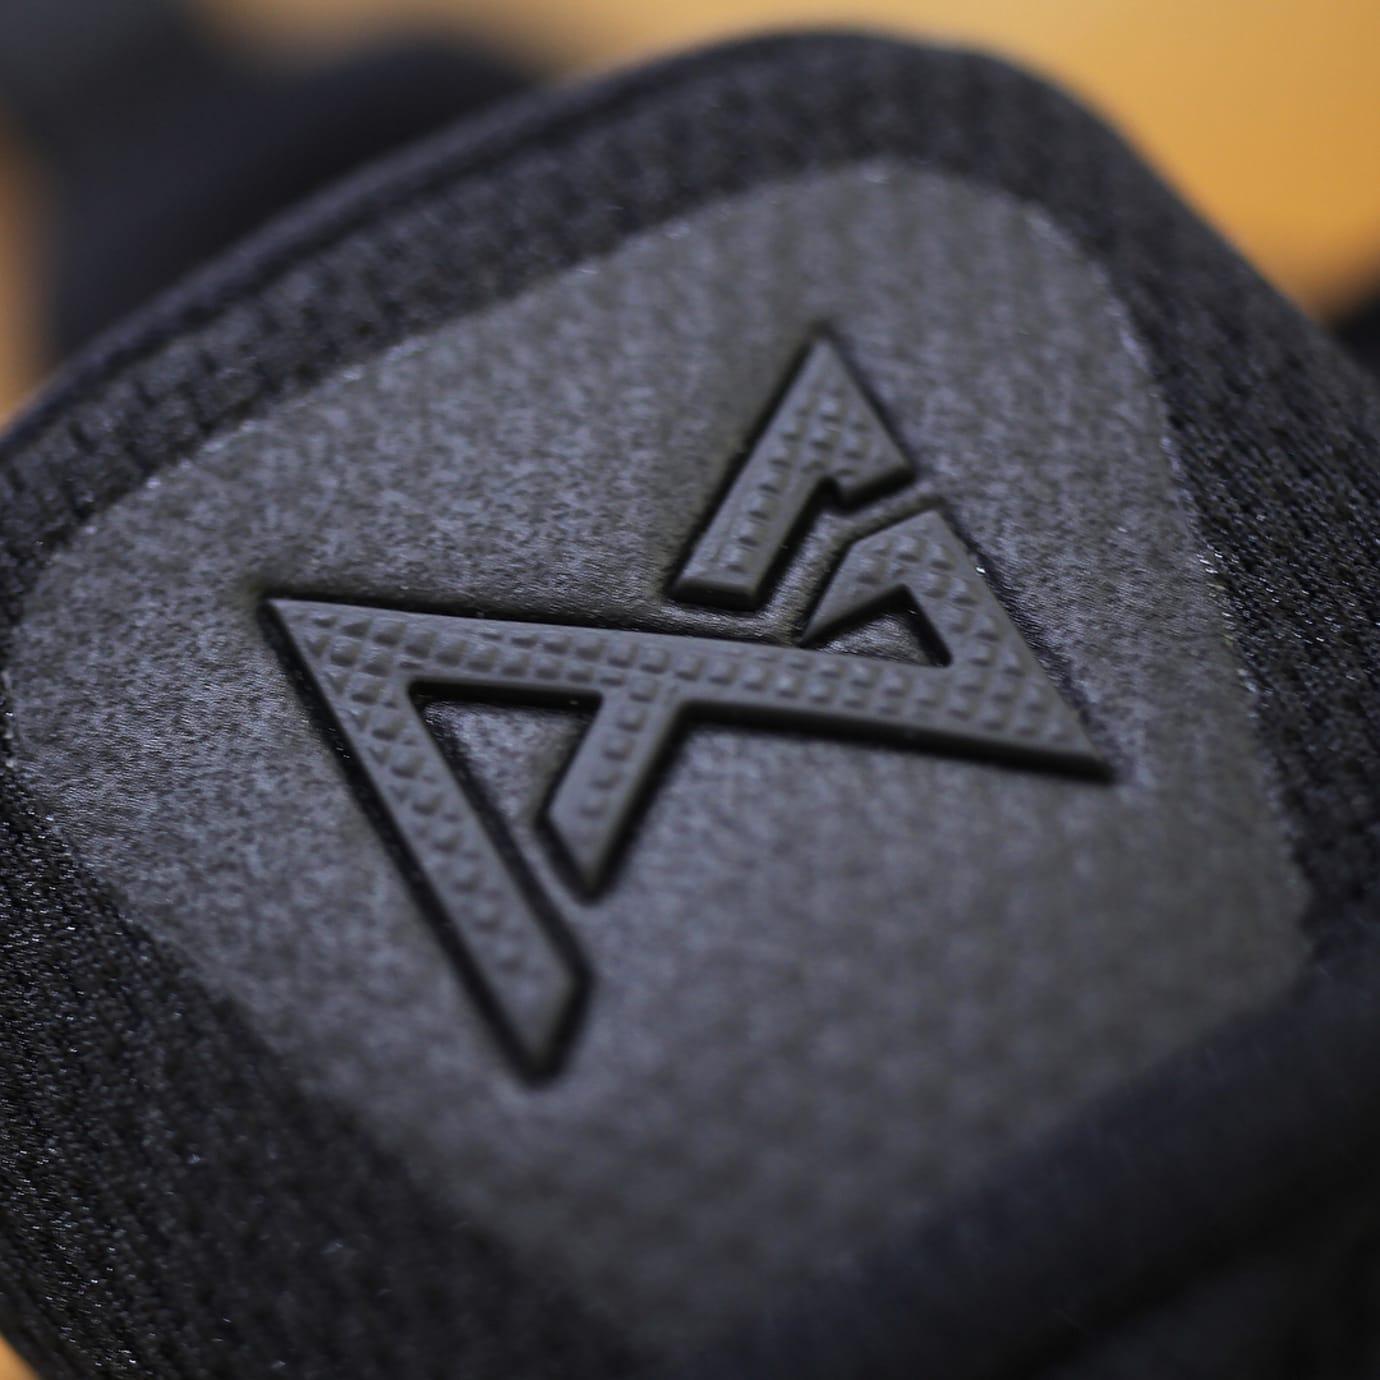 Nike PG1 Black Gum Release Date 878627-004 (7)